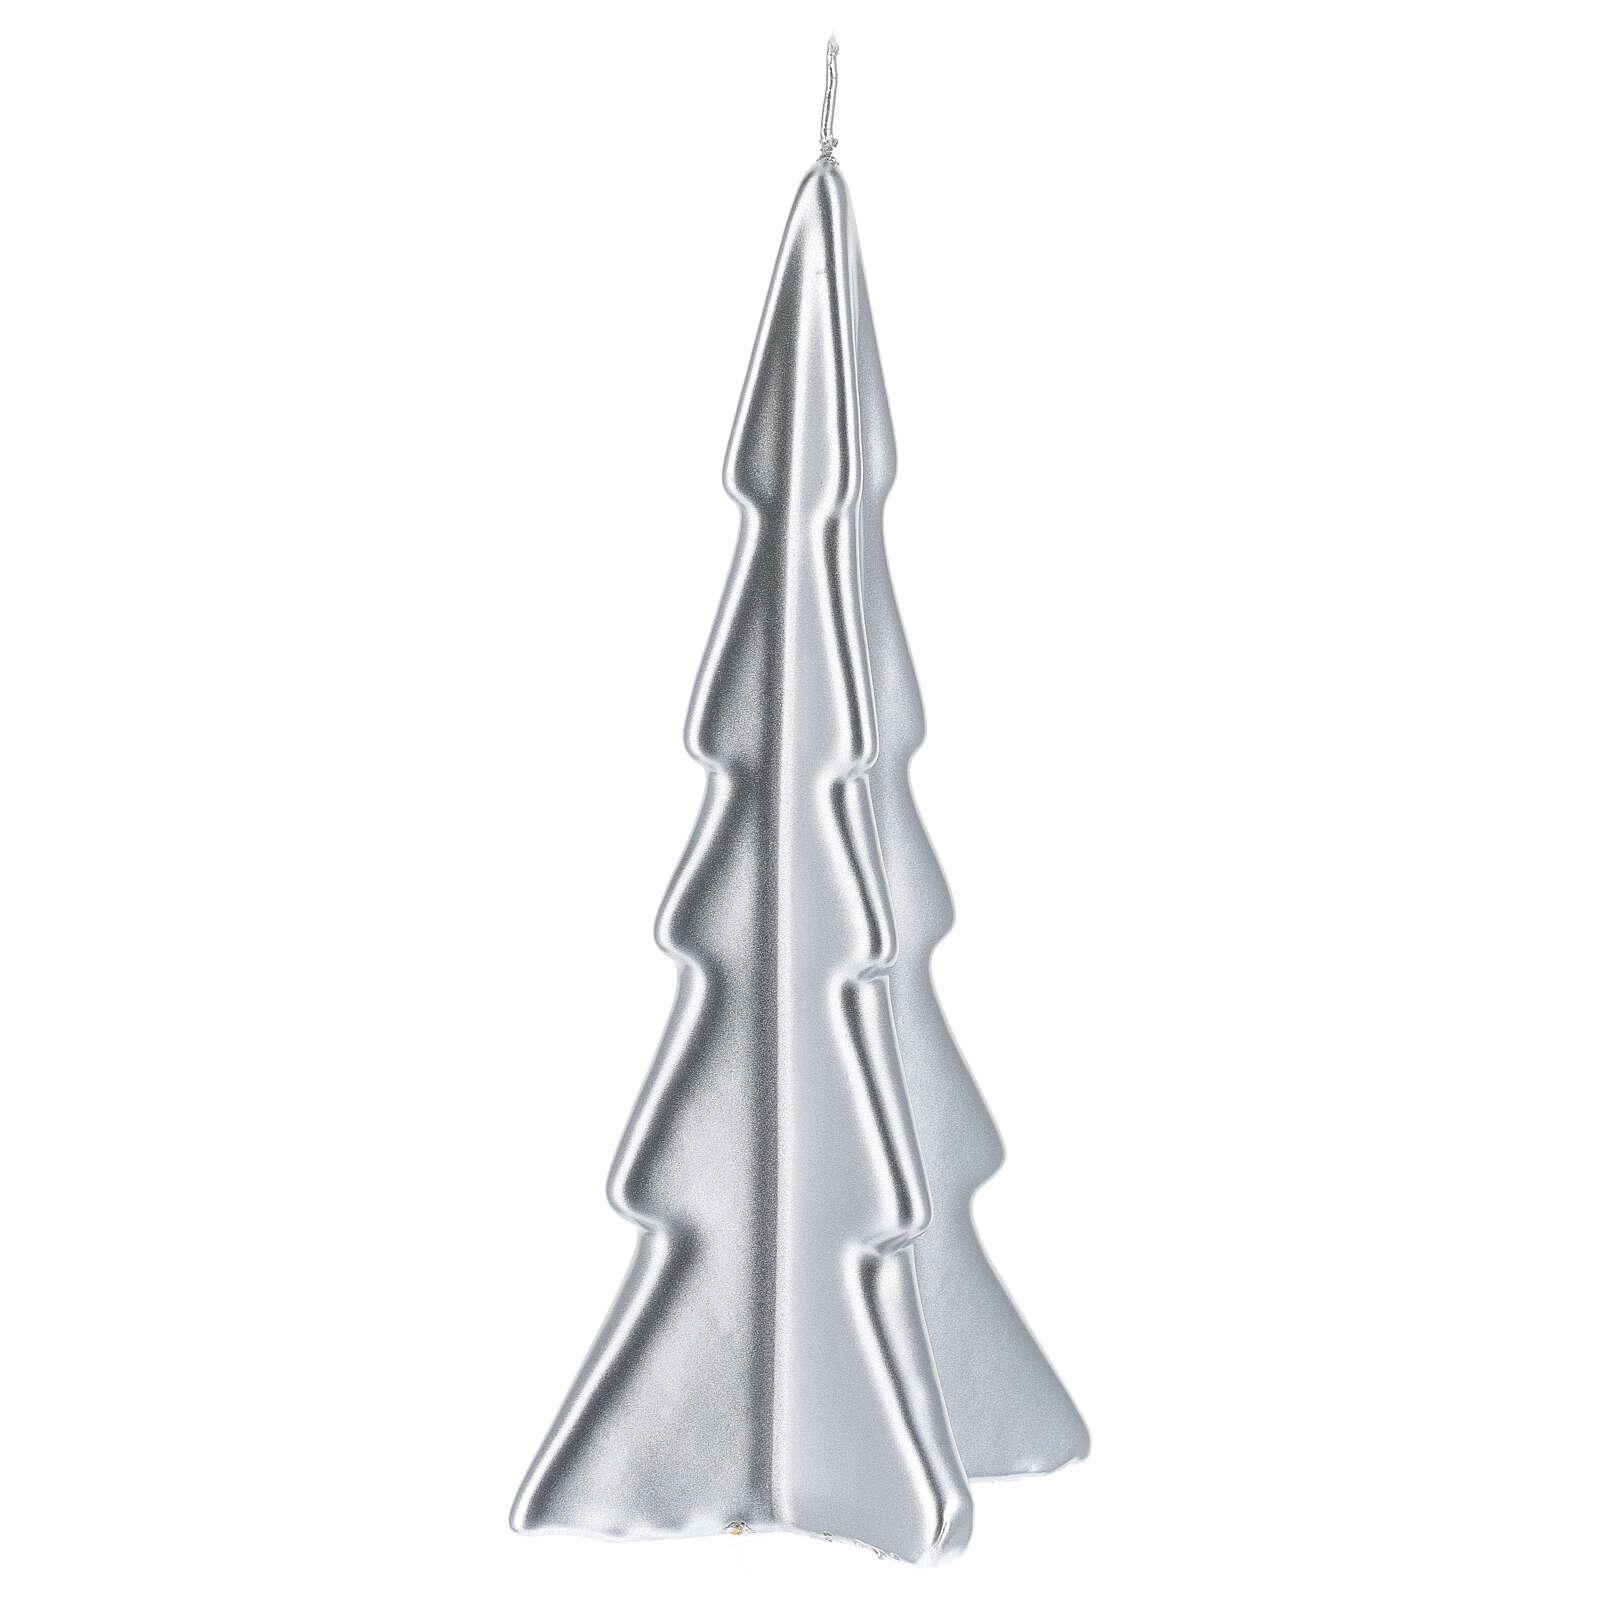 Vela de Natal árvore prateada modelo Oslo 20 cm 3